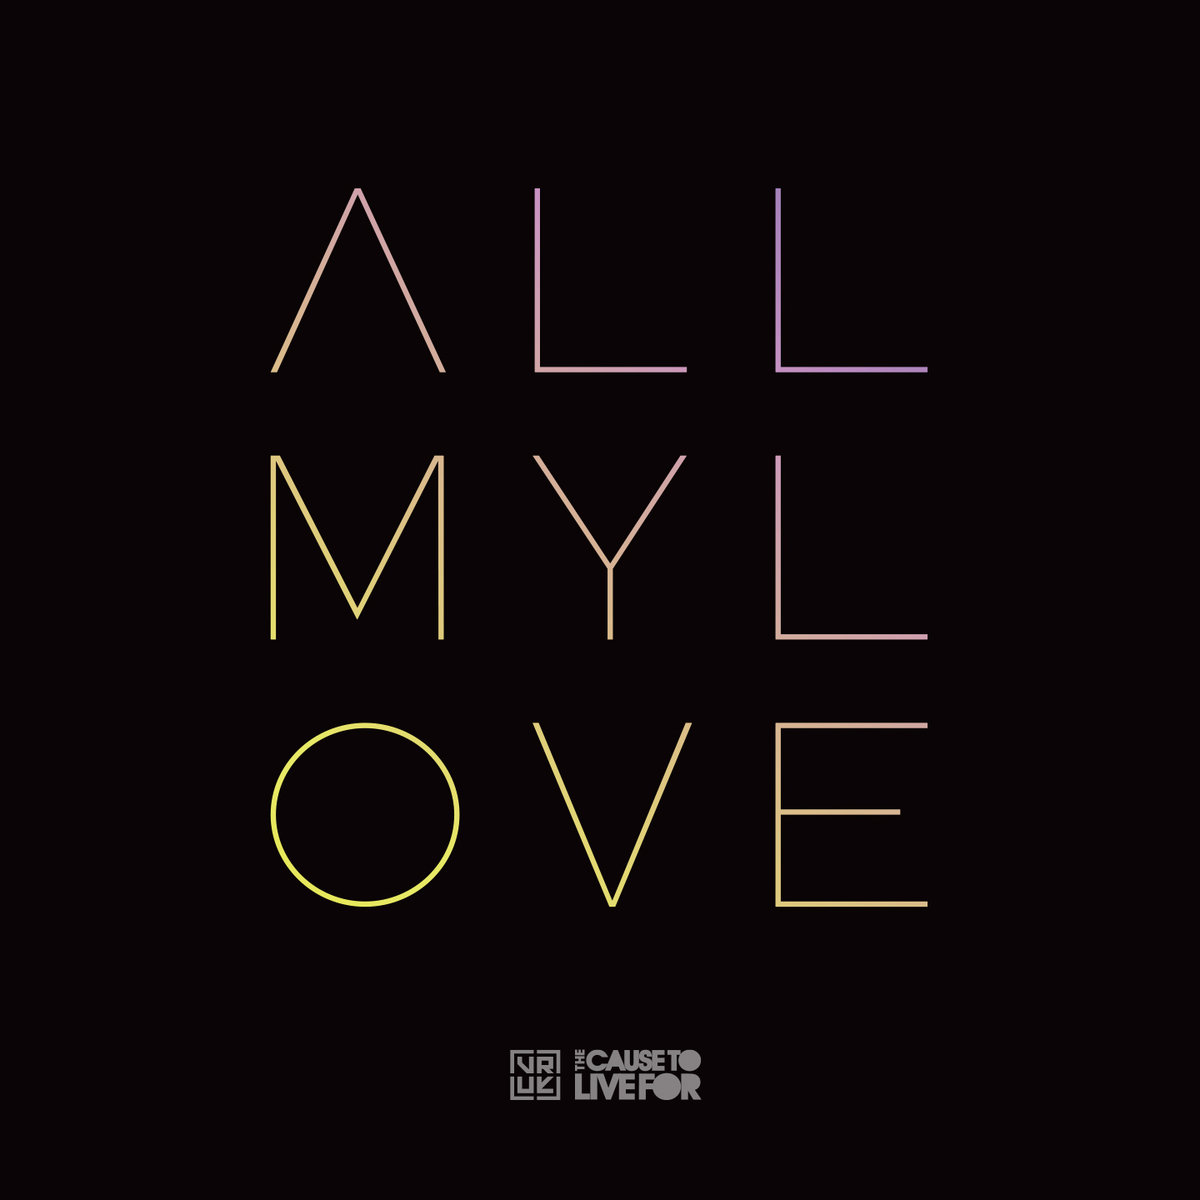 All My Love cover.jpg